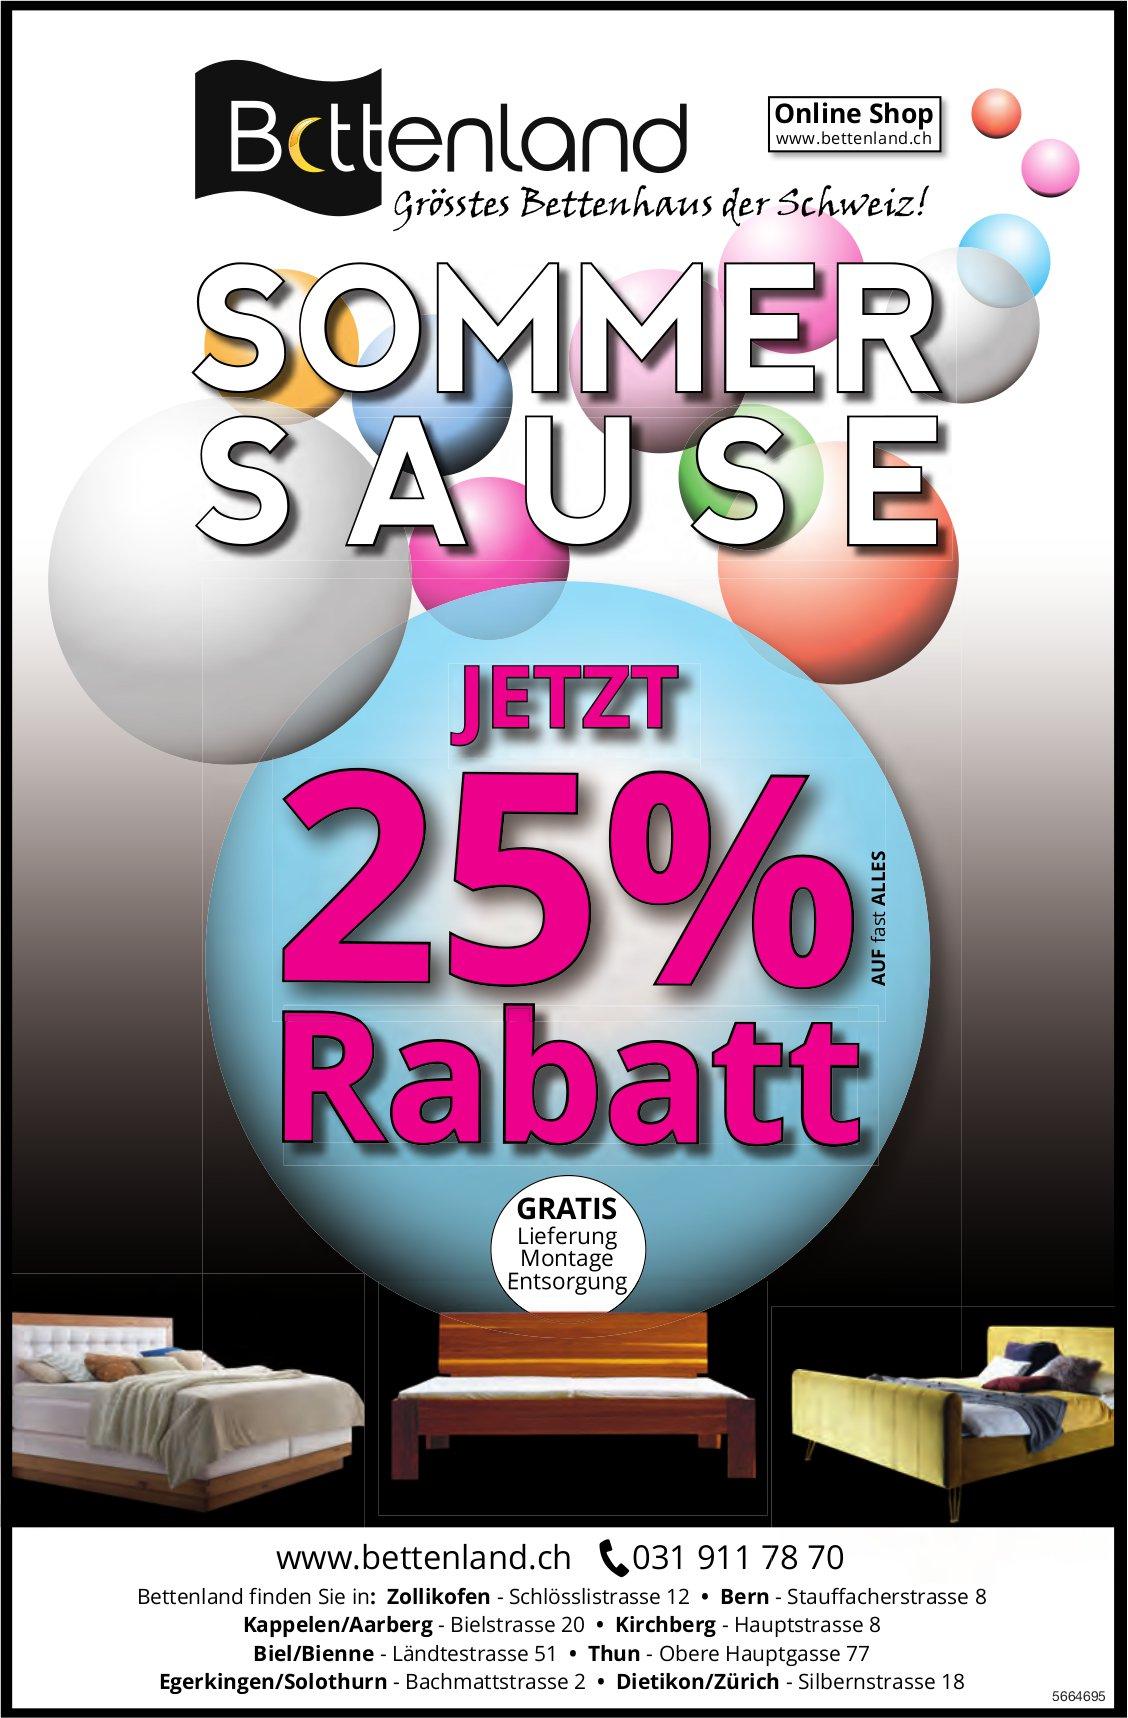 Bettenland - Sommer-Sause - Jetzt 25% Rabatt